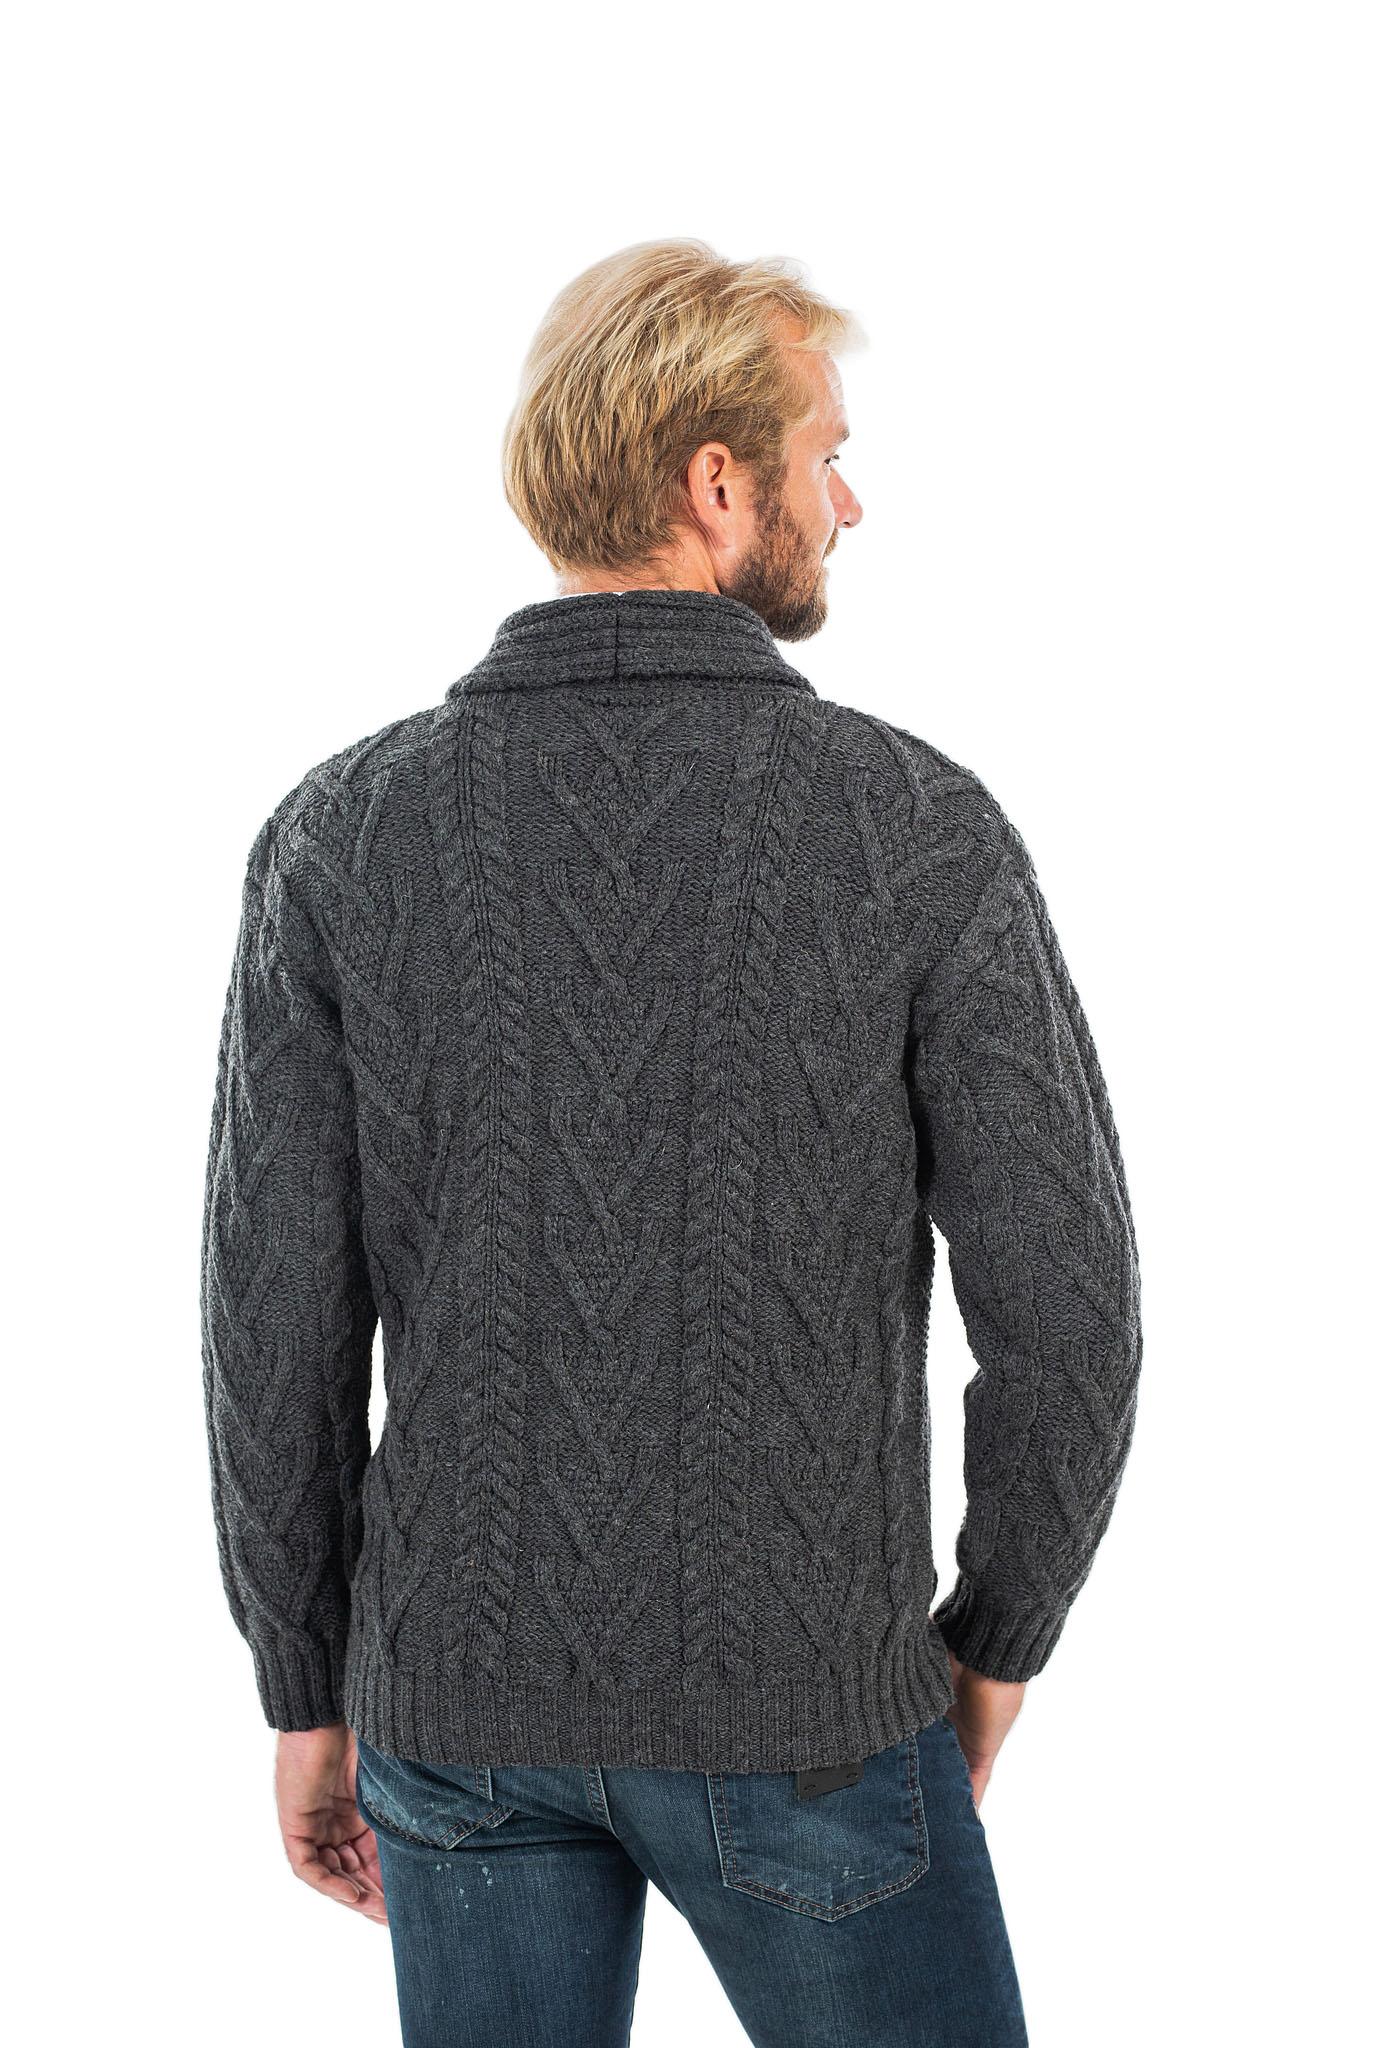 SAOL-Mens-Irish-Merino-Wool-Cardigan-Shawl-Collar-Front-Pockets-Aran-Cable-Knit thumbnail 29